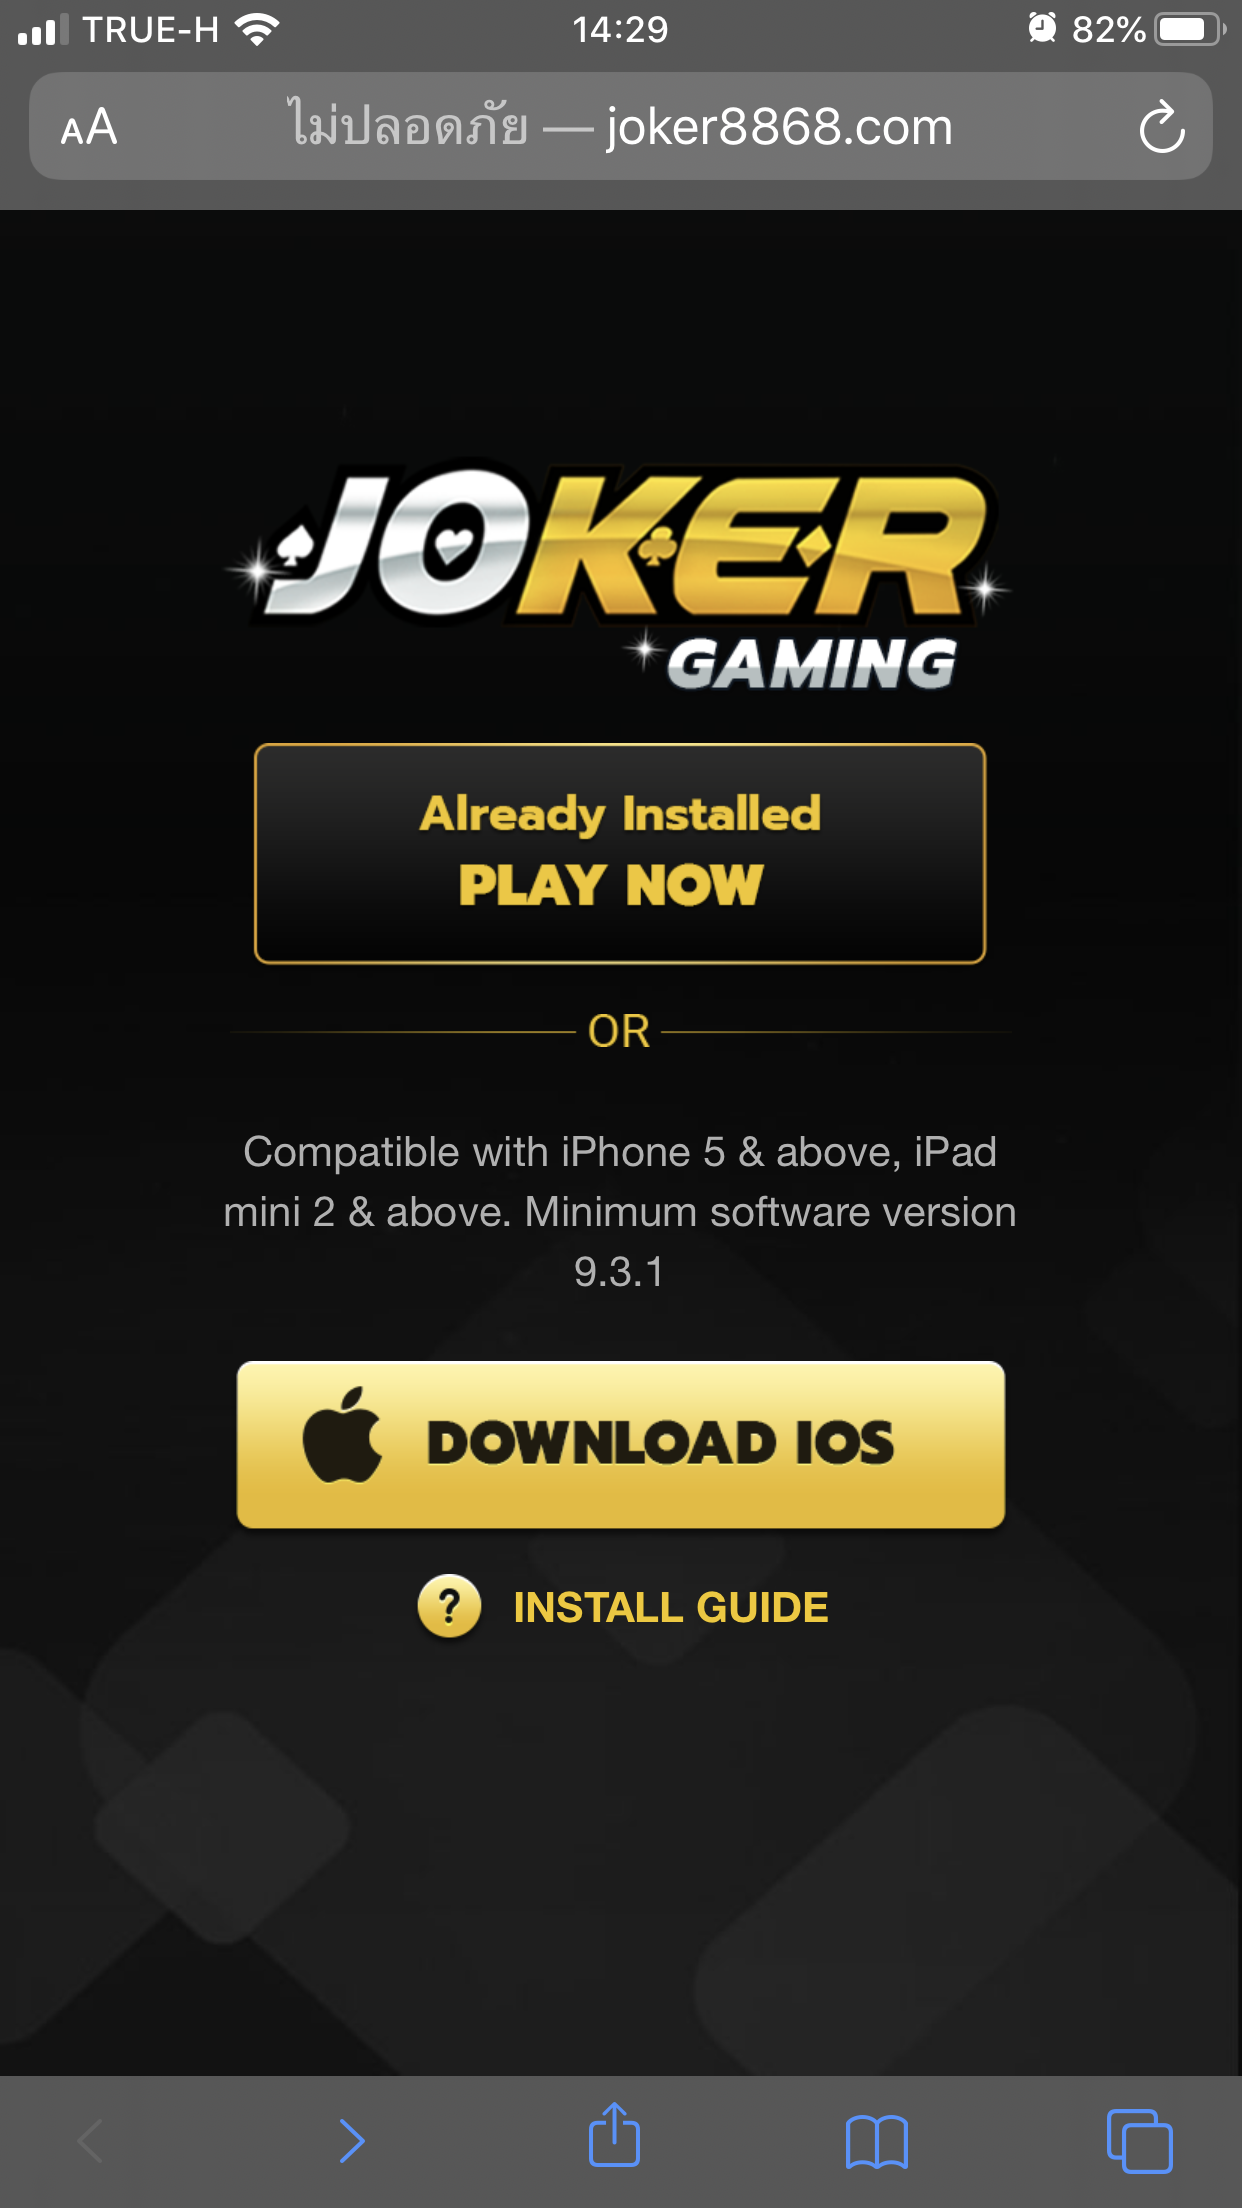 Download Joker Slot สำหรับระบบ iOS - Step 1